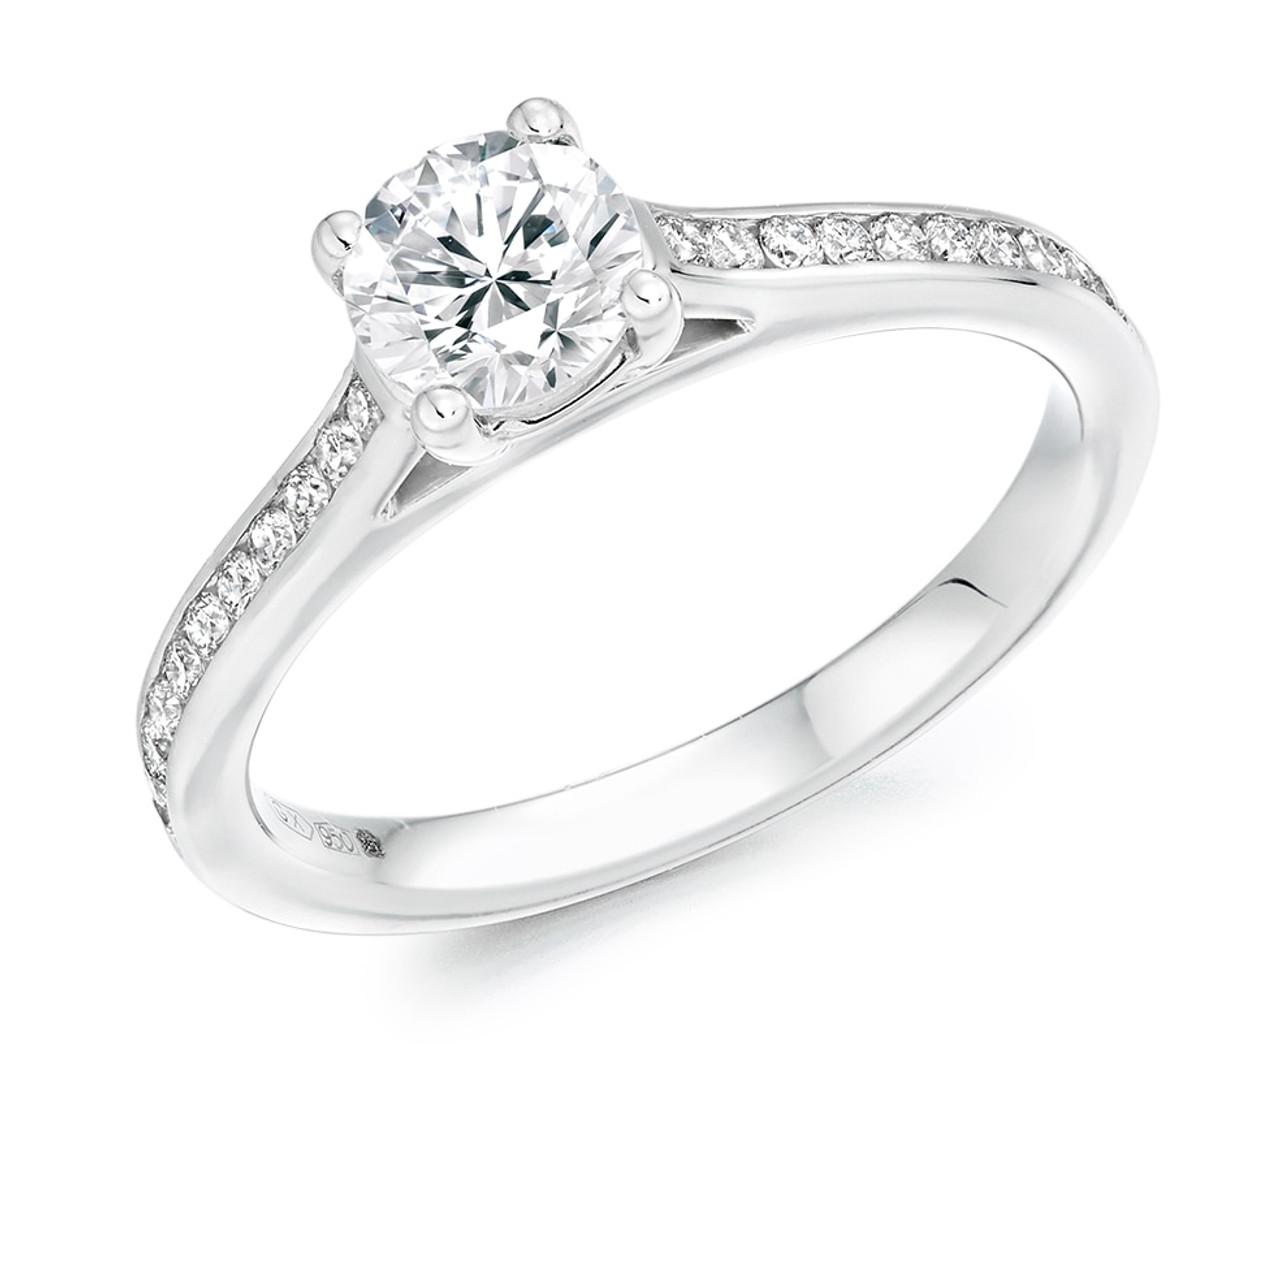 Hawthorn 0.70ct Diamond Engagement Ring